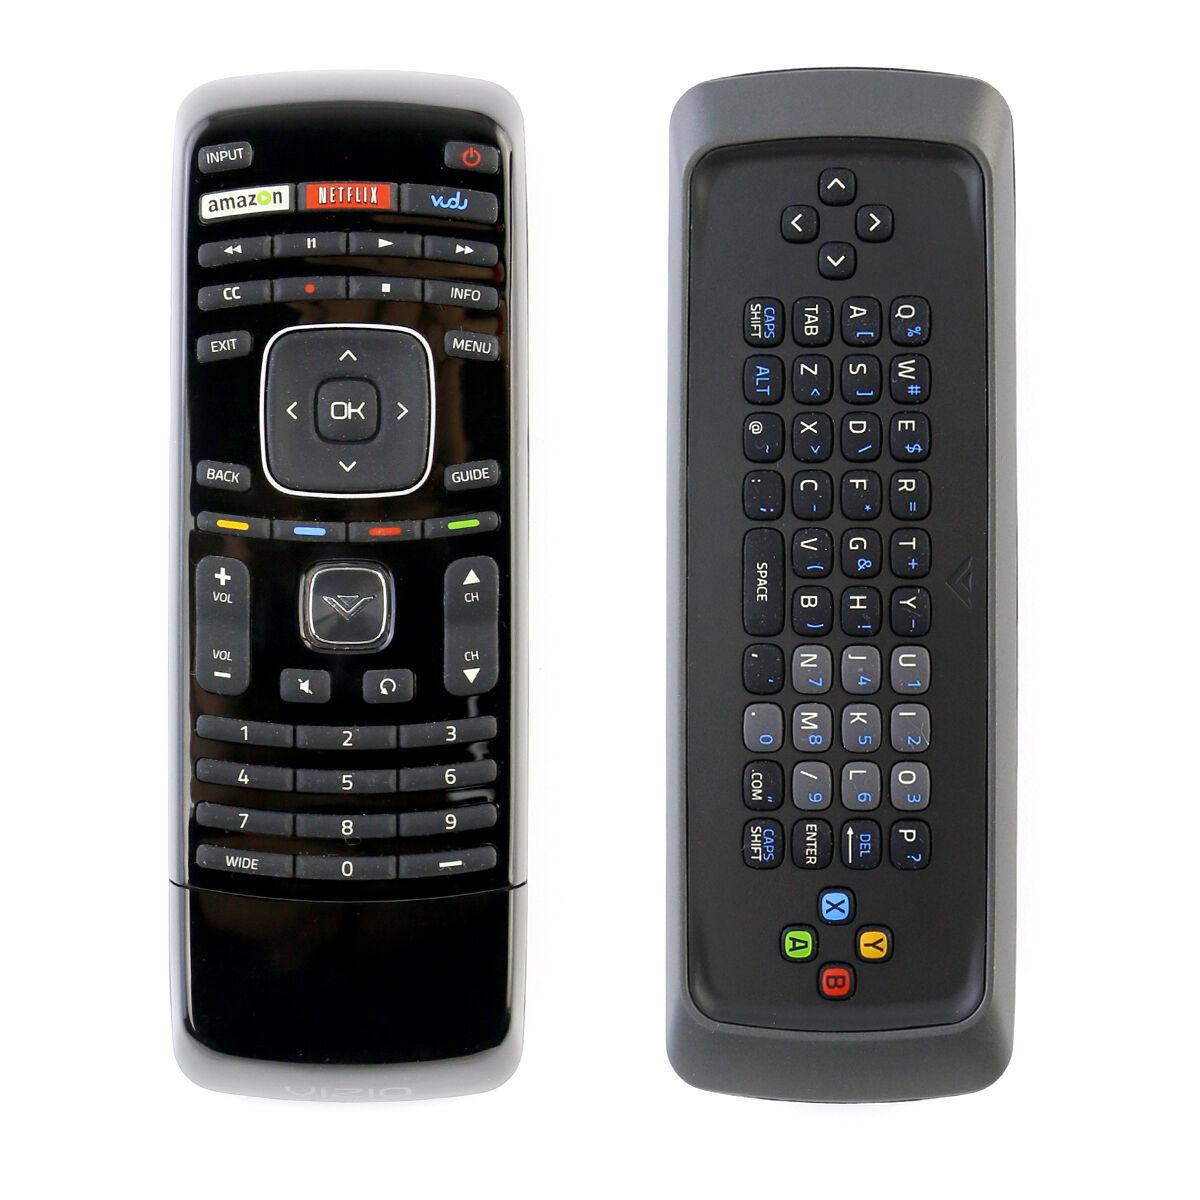 Vizio Genuine XRT300 Qwerty Keyboard Remote Control with Vudu for VIZIO Smart TV